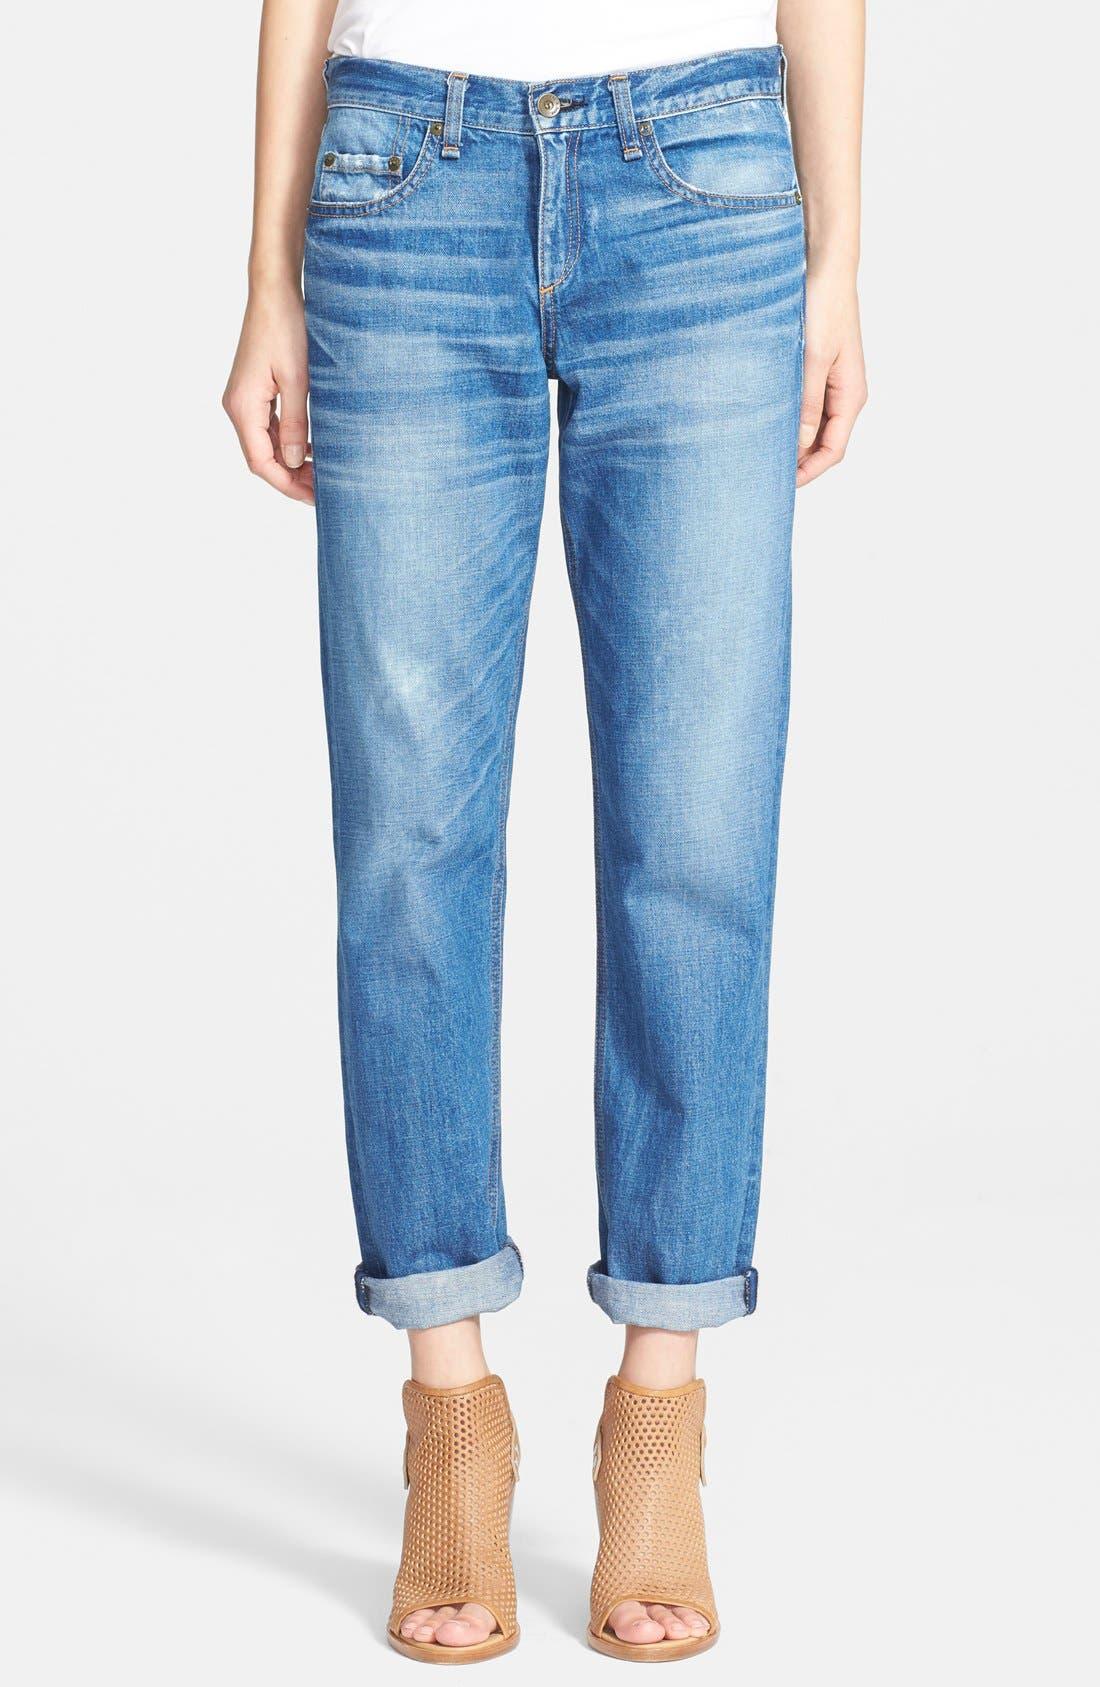 RAG & BONE JEAN Boyfriend Jeans, Main, color, 400